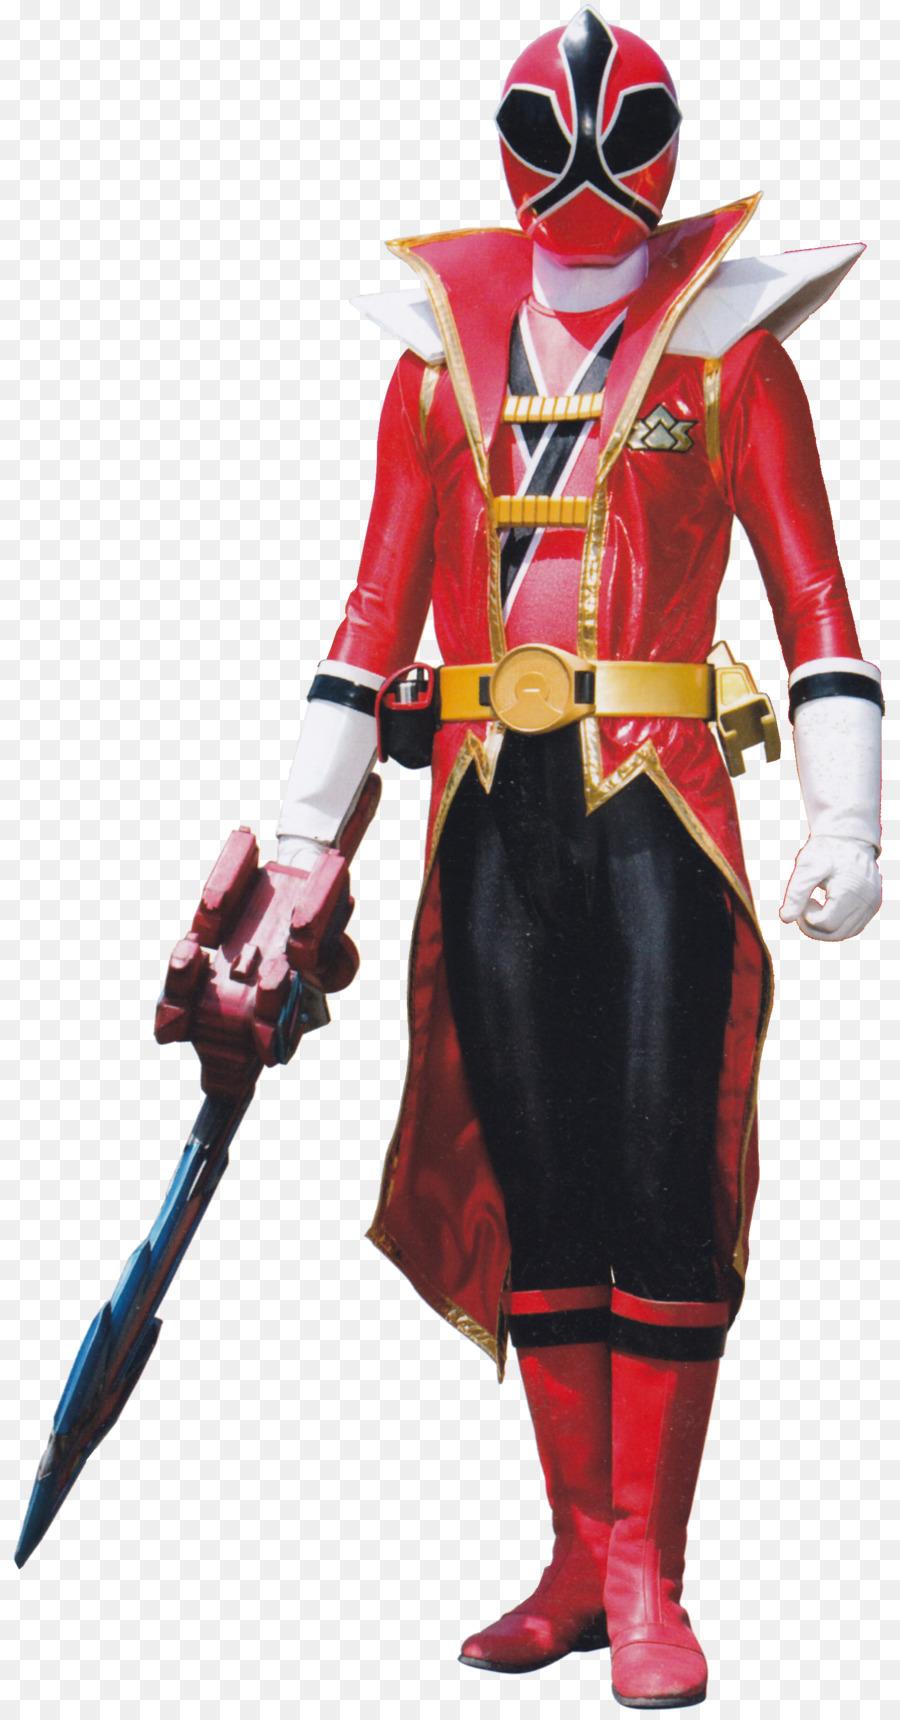 Entertaining Power rangers samurai consider, that